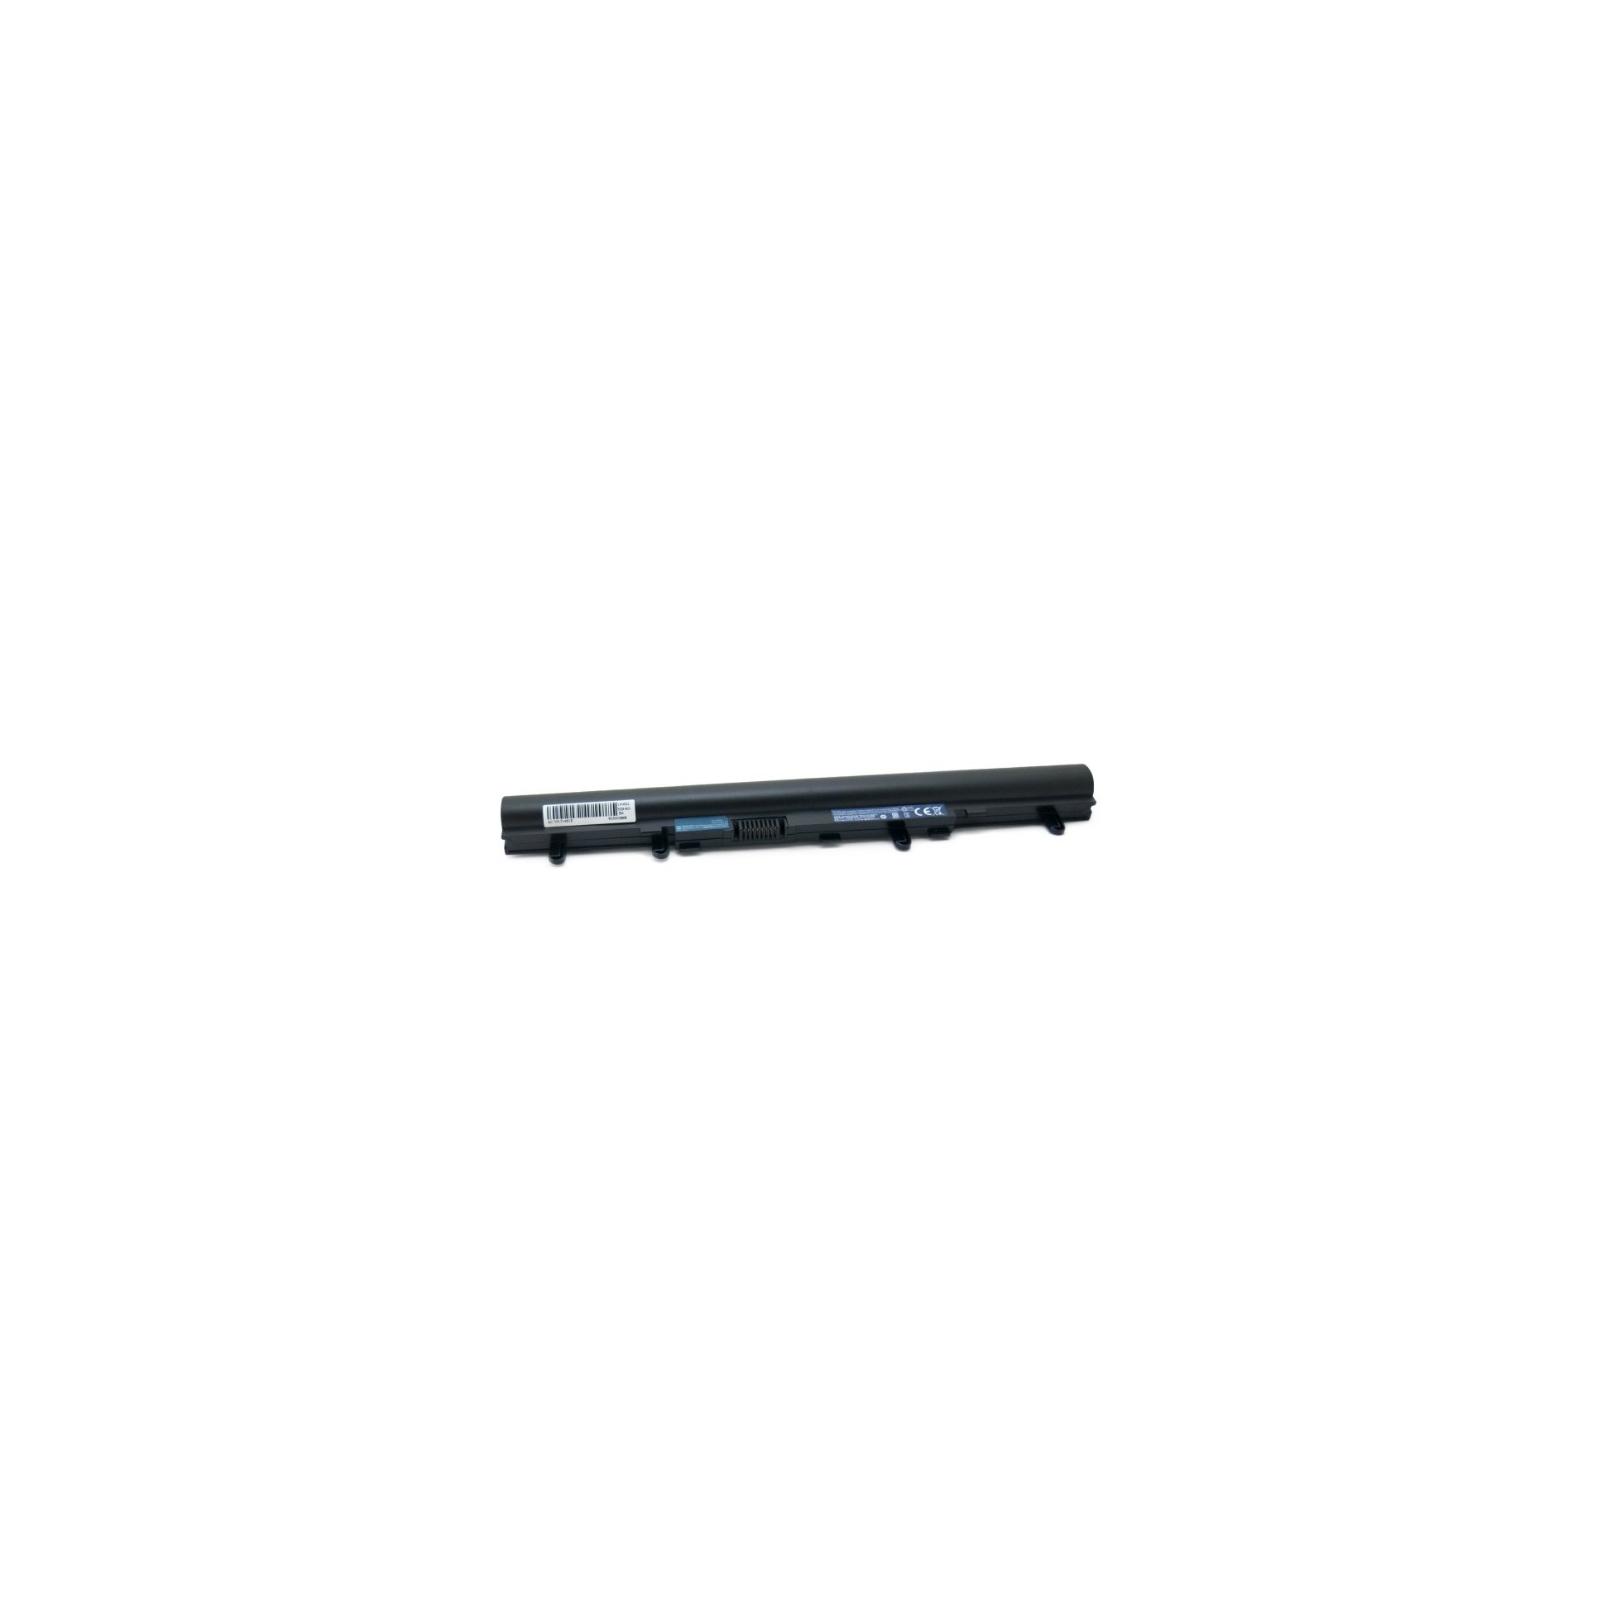 Аккумулятор для ноутбука Acer Aspire V5 (AL12A32) 14.8V, 2600mAh Extradigital (BNA4002)